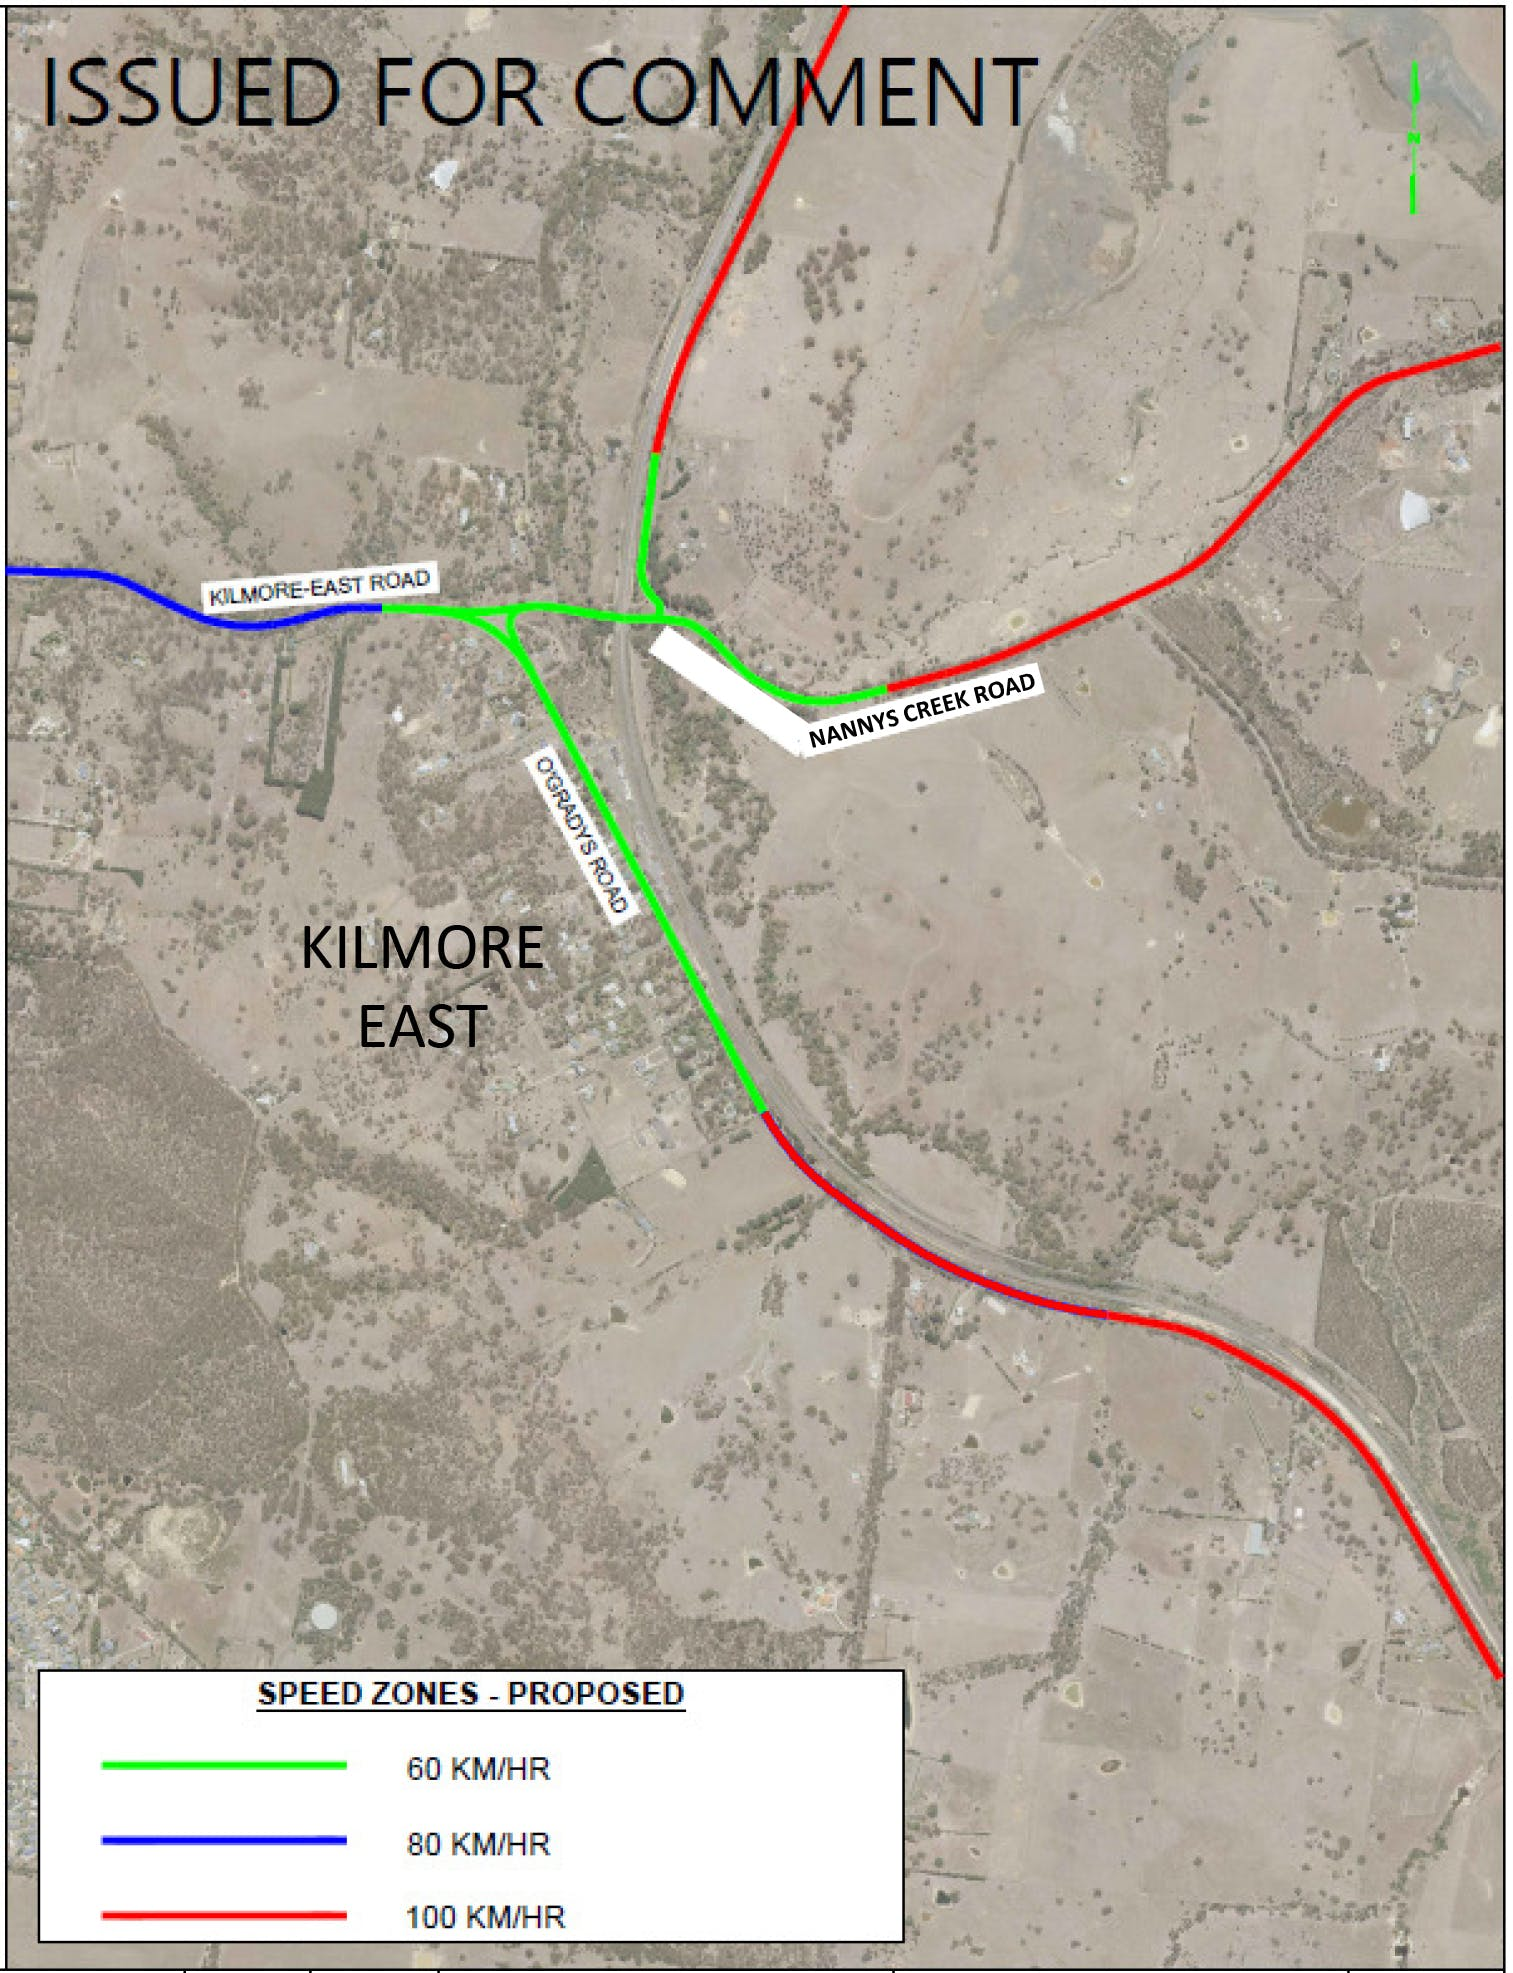 Kilmore East Speed Zone Map